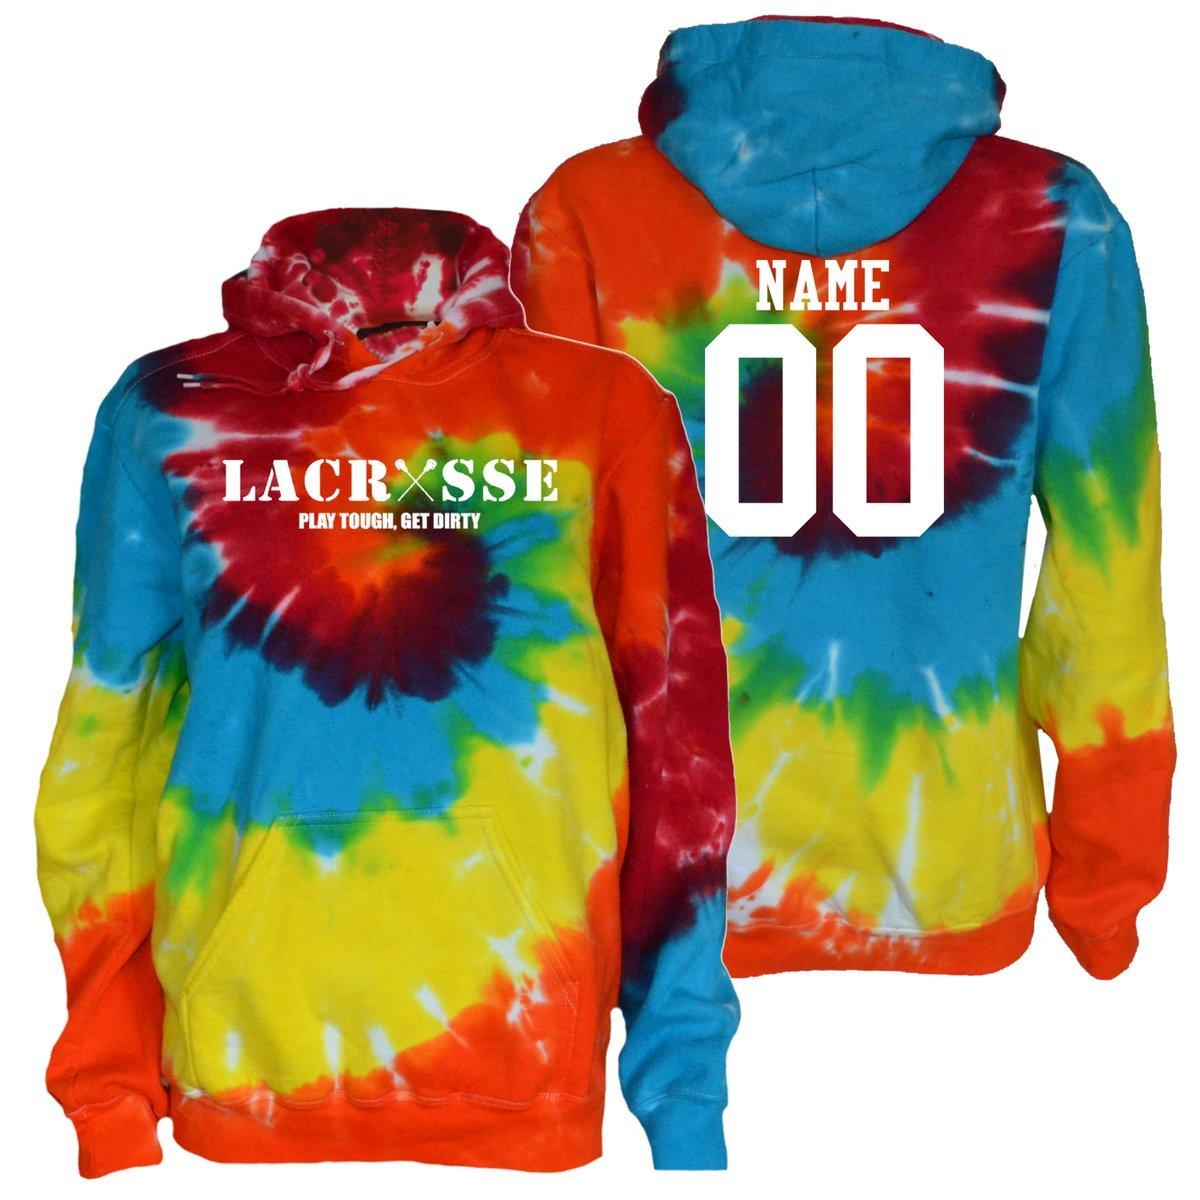 JANT girl Custom Lacrosse Tie Dye Sweatshirt - Lacrosse Play Tough Get Dirty White Logo (Rainbow Twist, YM)